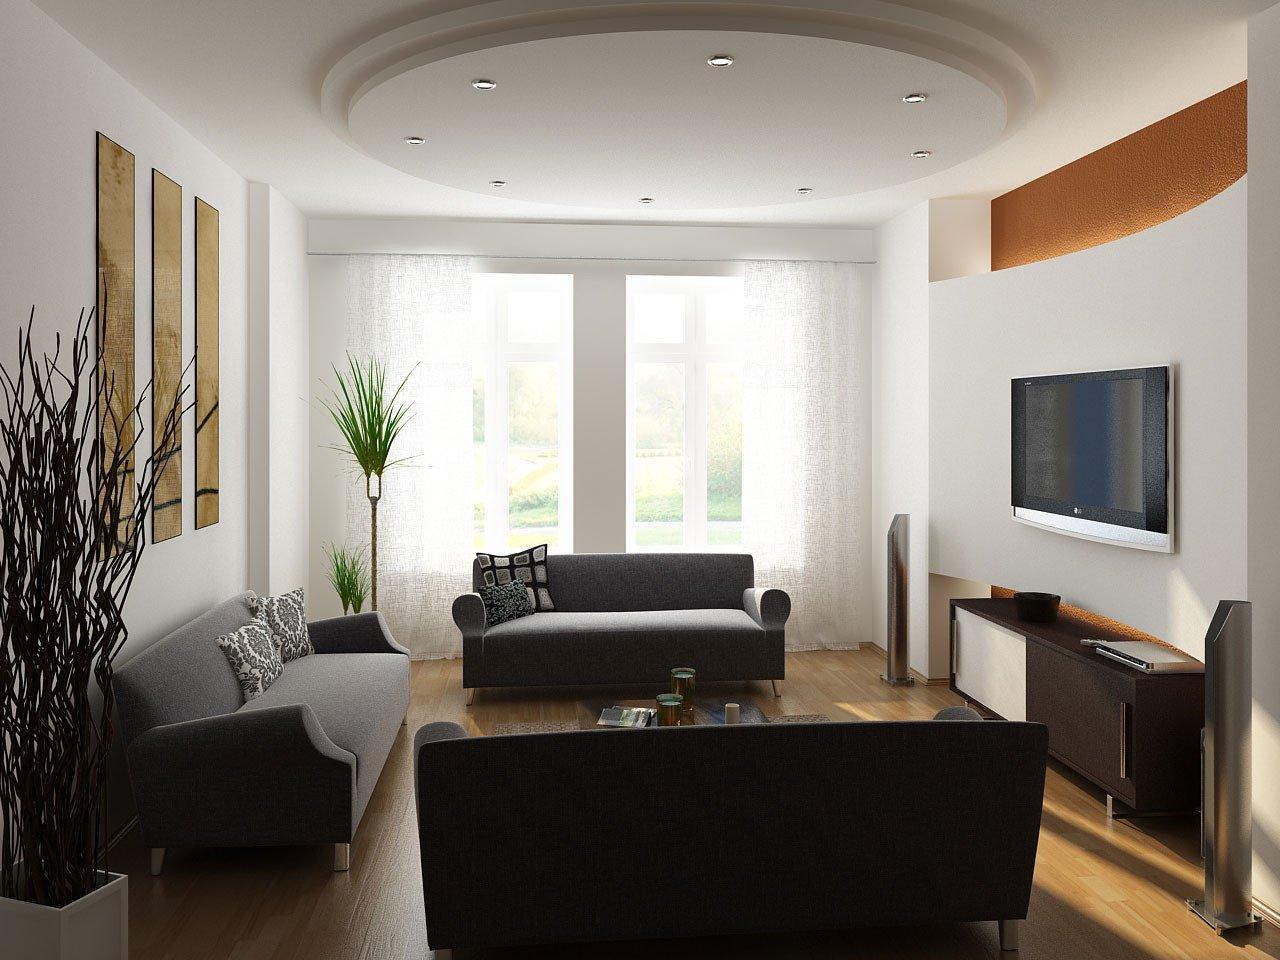 Modern Living Room Wall Decor Lovely Modern Living Room Inspiration for Your Rich Home Decor Amaza Design